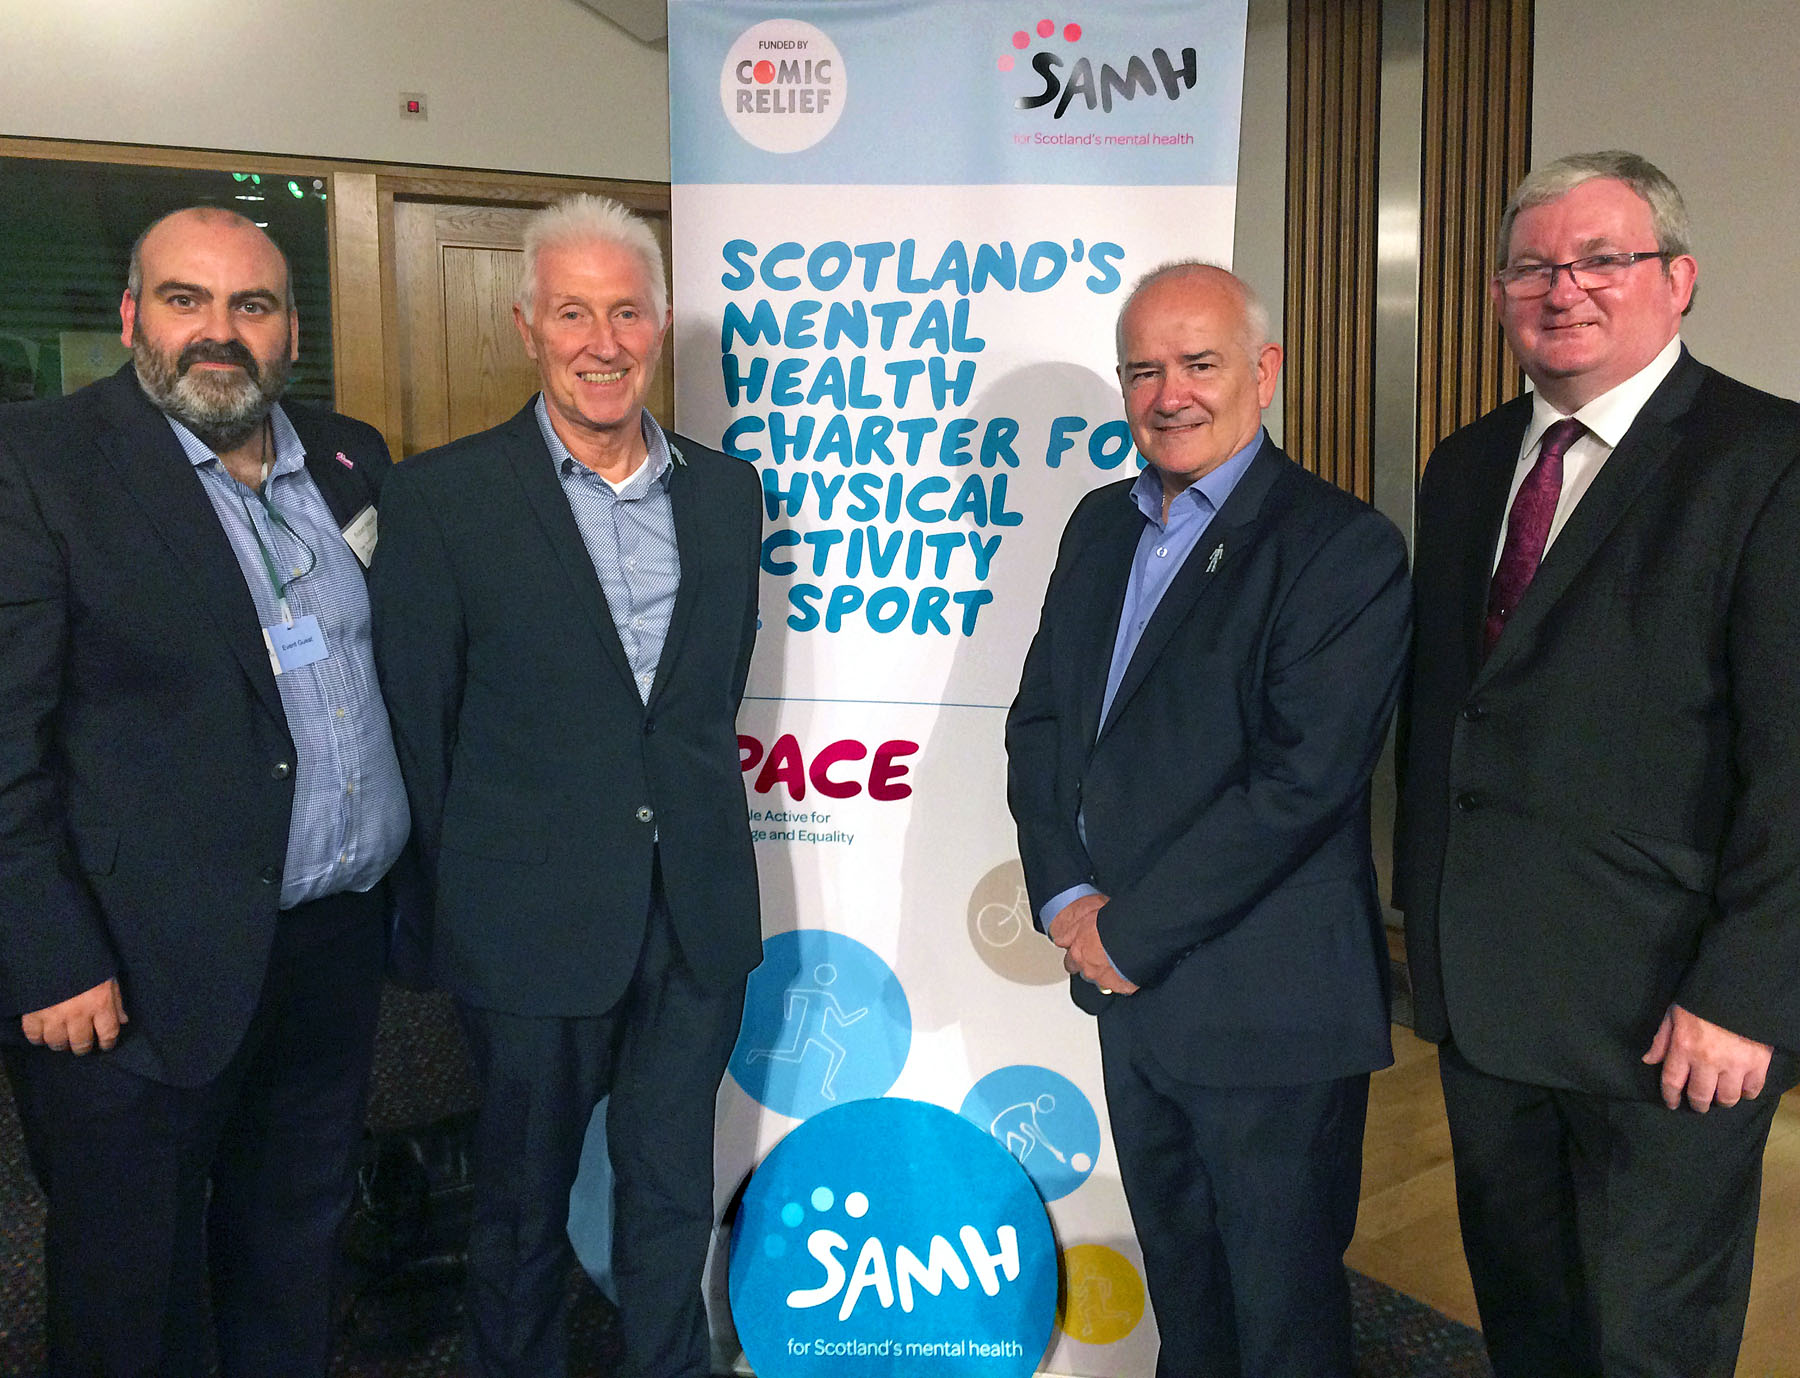 l-r Robert Nesbitt SAMH, Colin Mackay, Gary McLaughlin and Angus MacDonald MSP